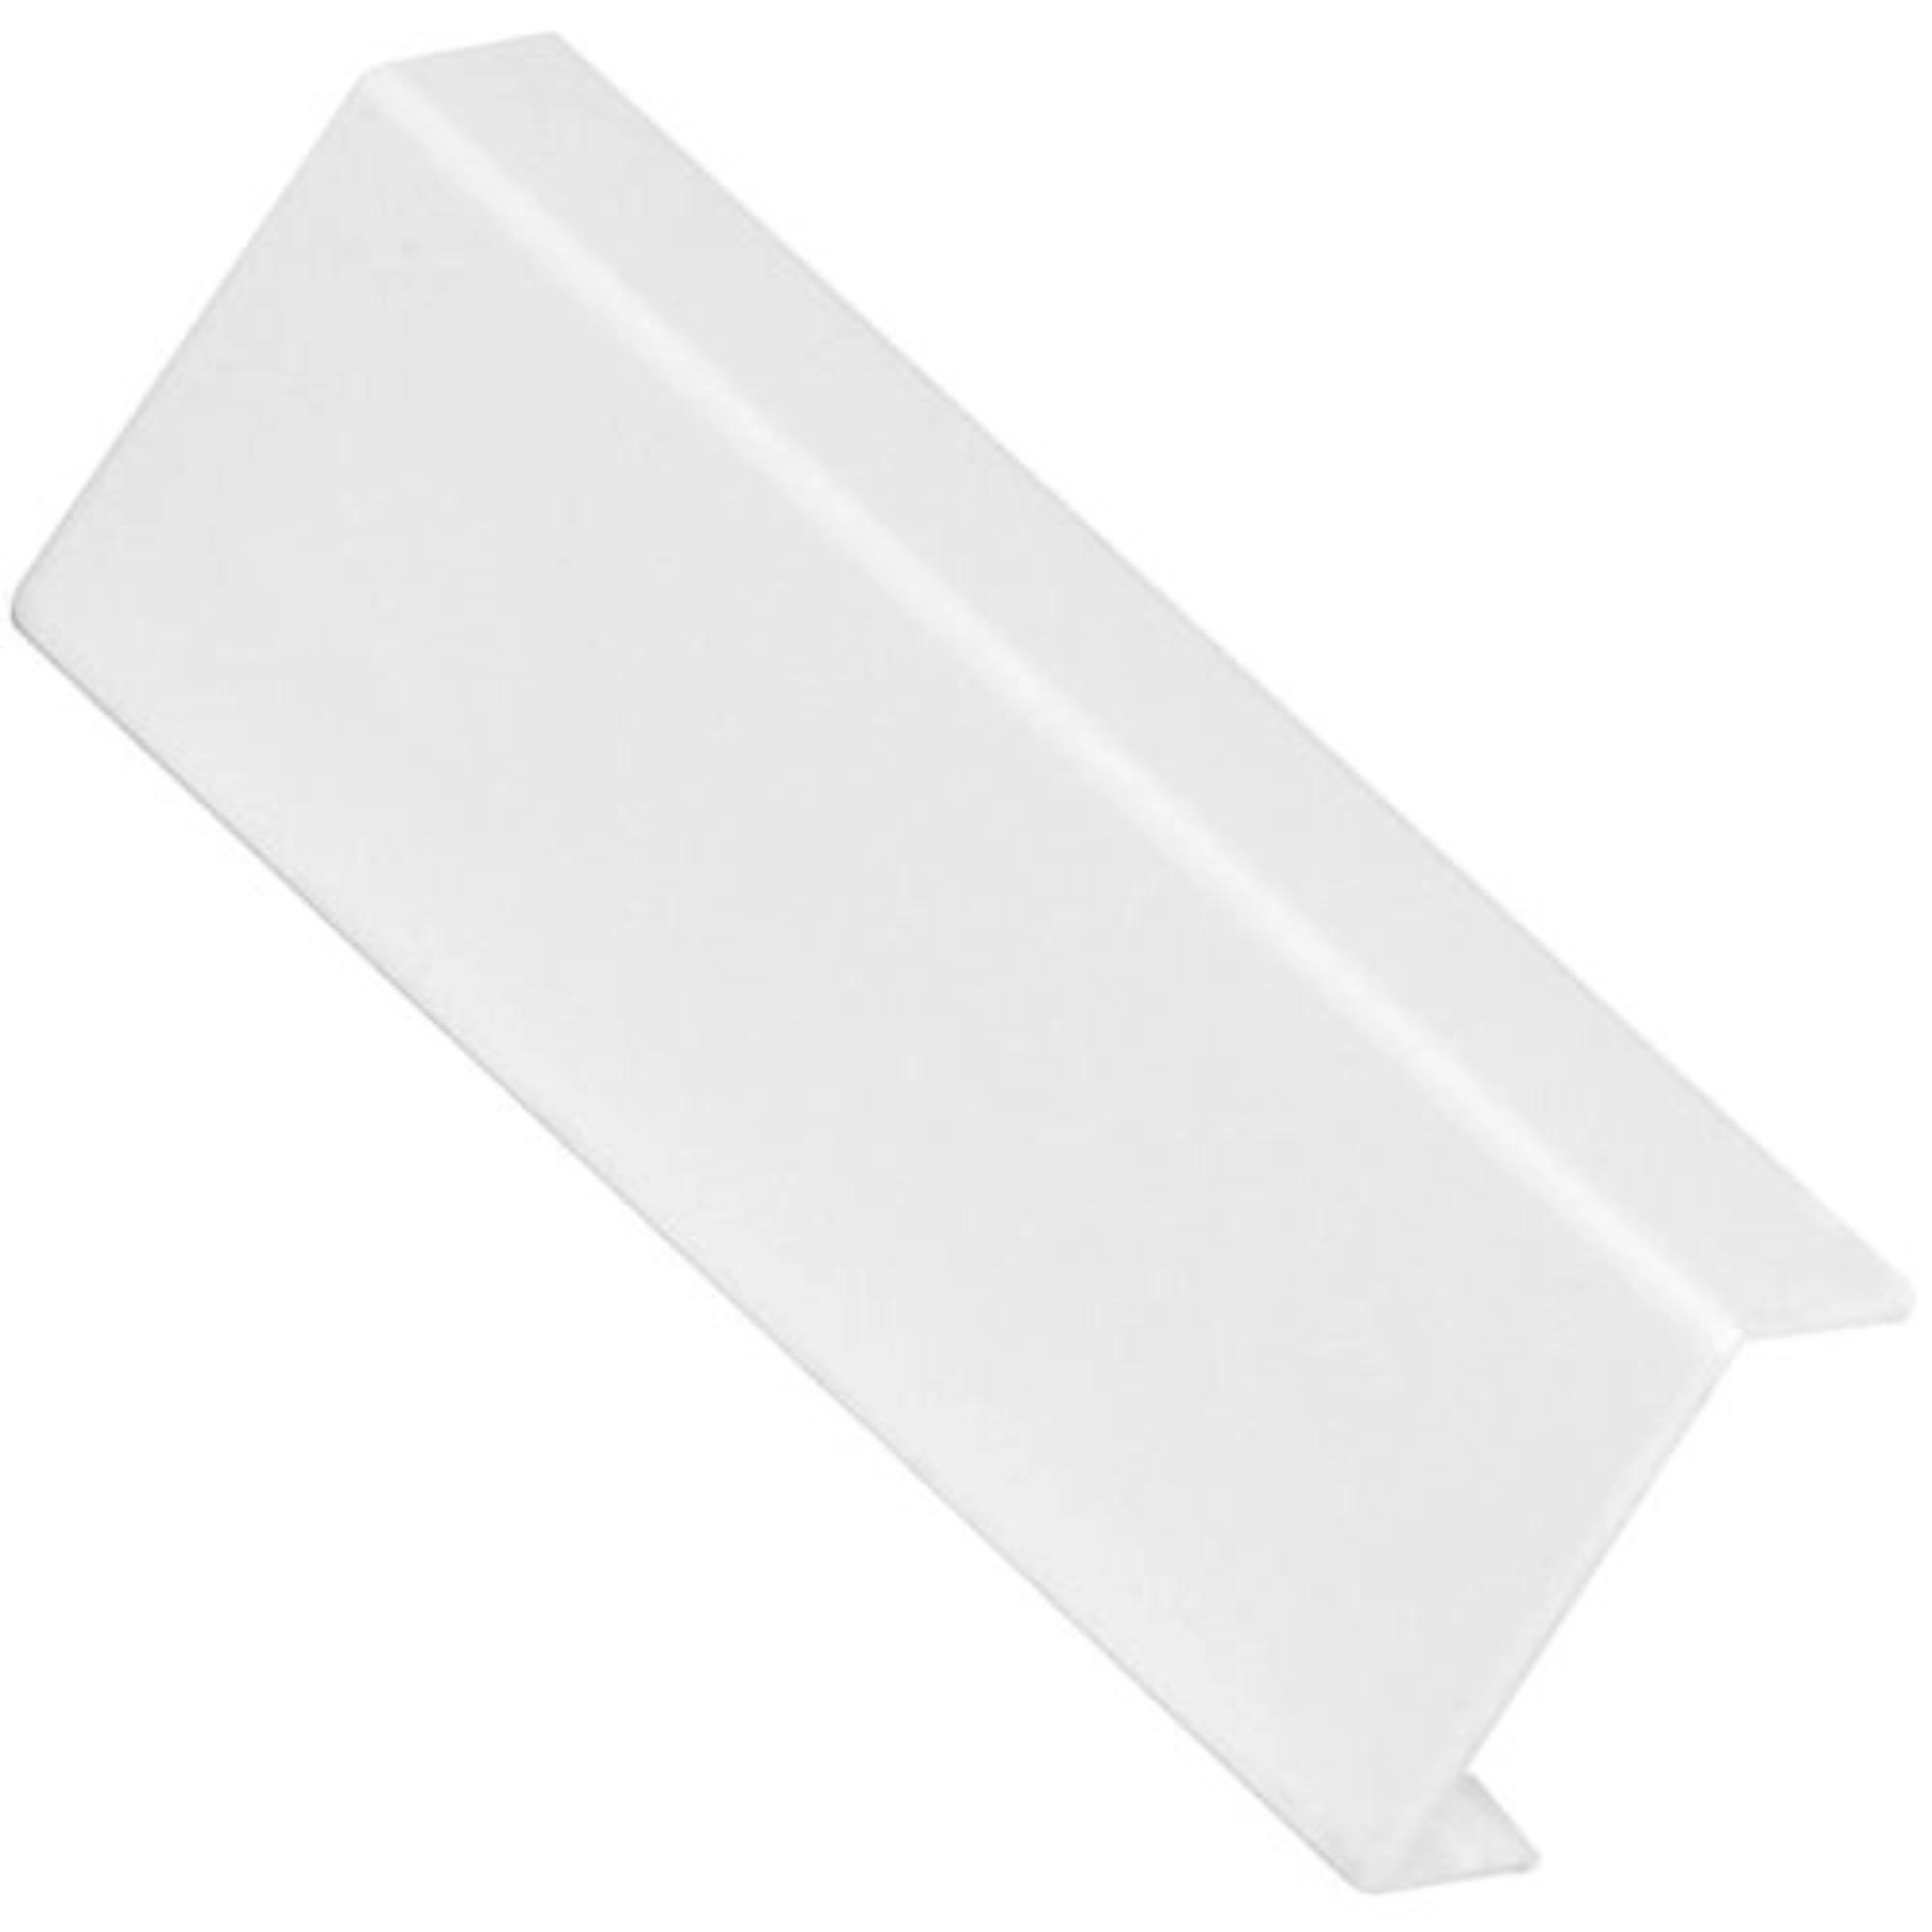 Luva P/ Canaleta 20x10mm Sistema X Branco C/ 10 Unidades